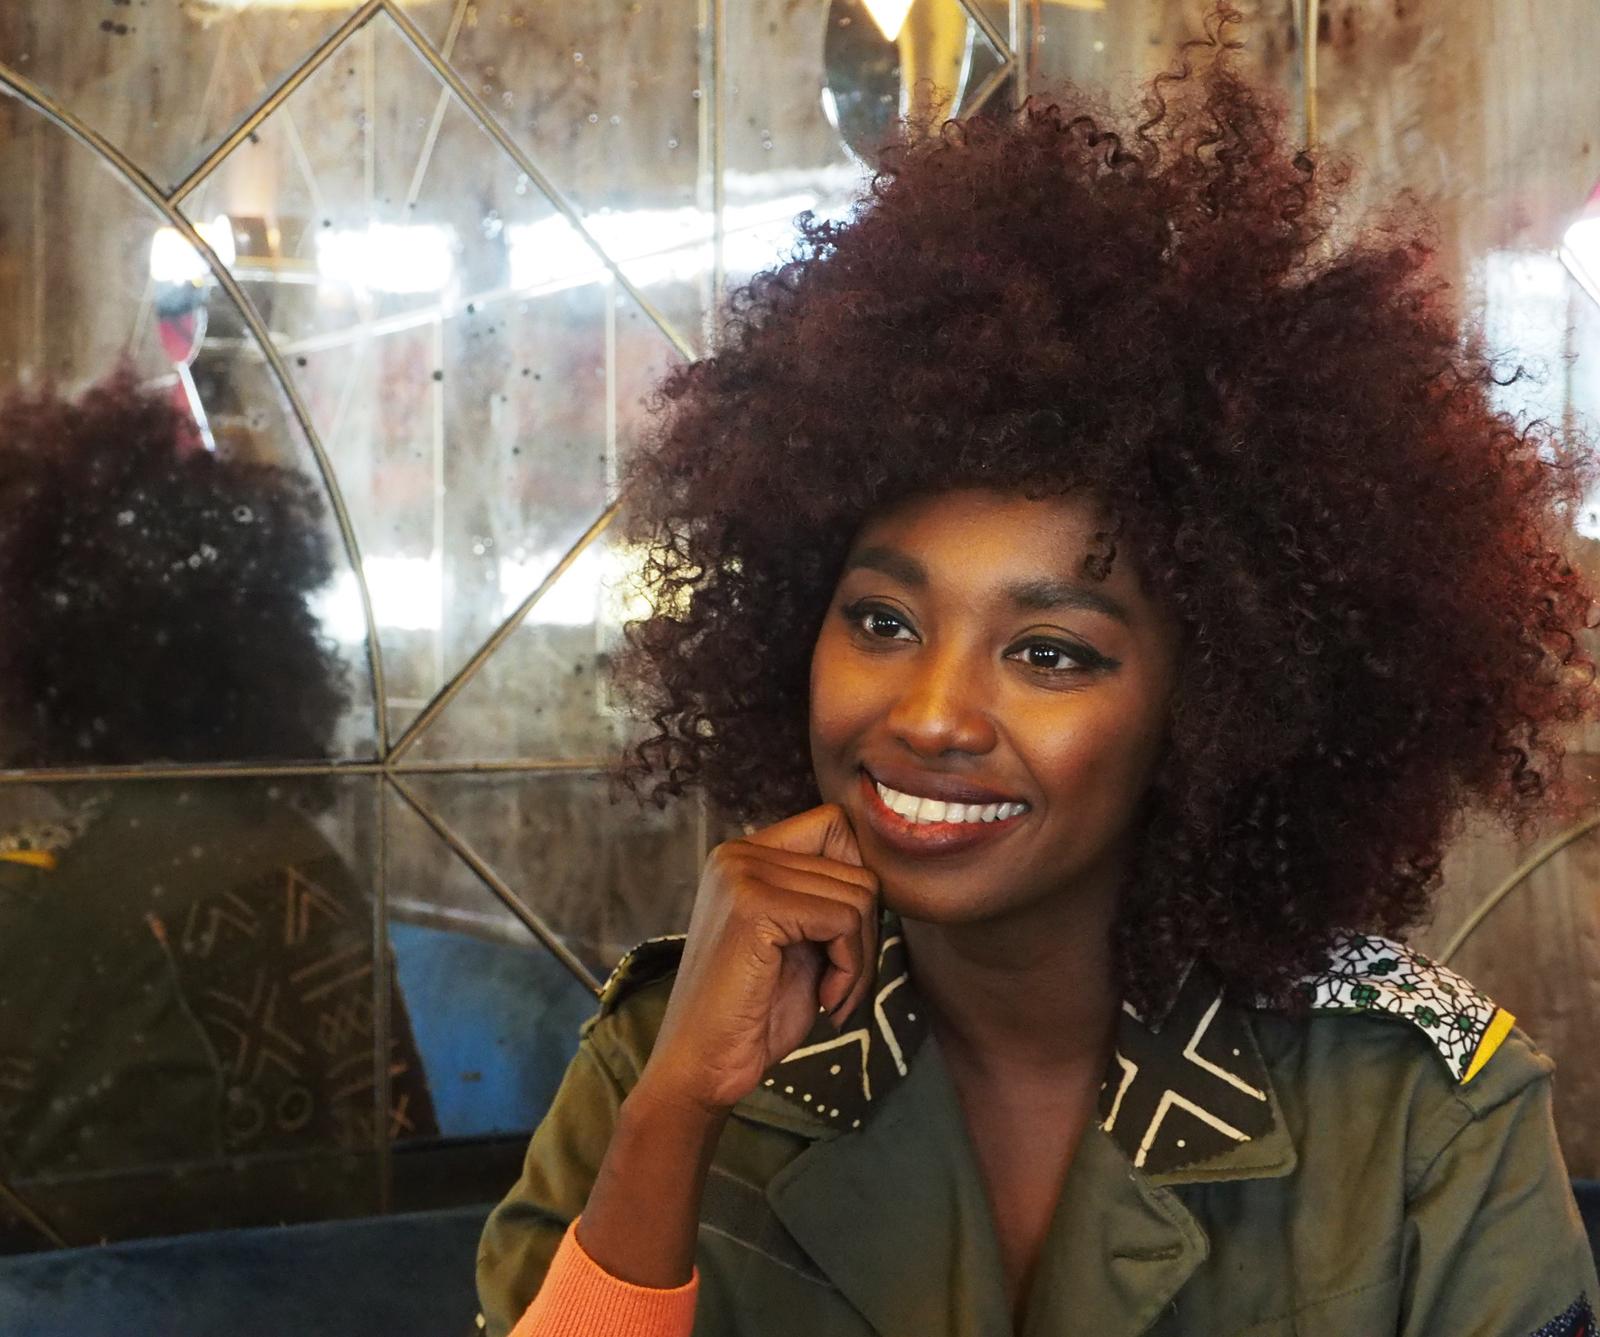 Inna Modja smile lookée nappy interview pour nouvel album Motel Bamako warner music 2015 photo originale united states of paris blog usofparis